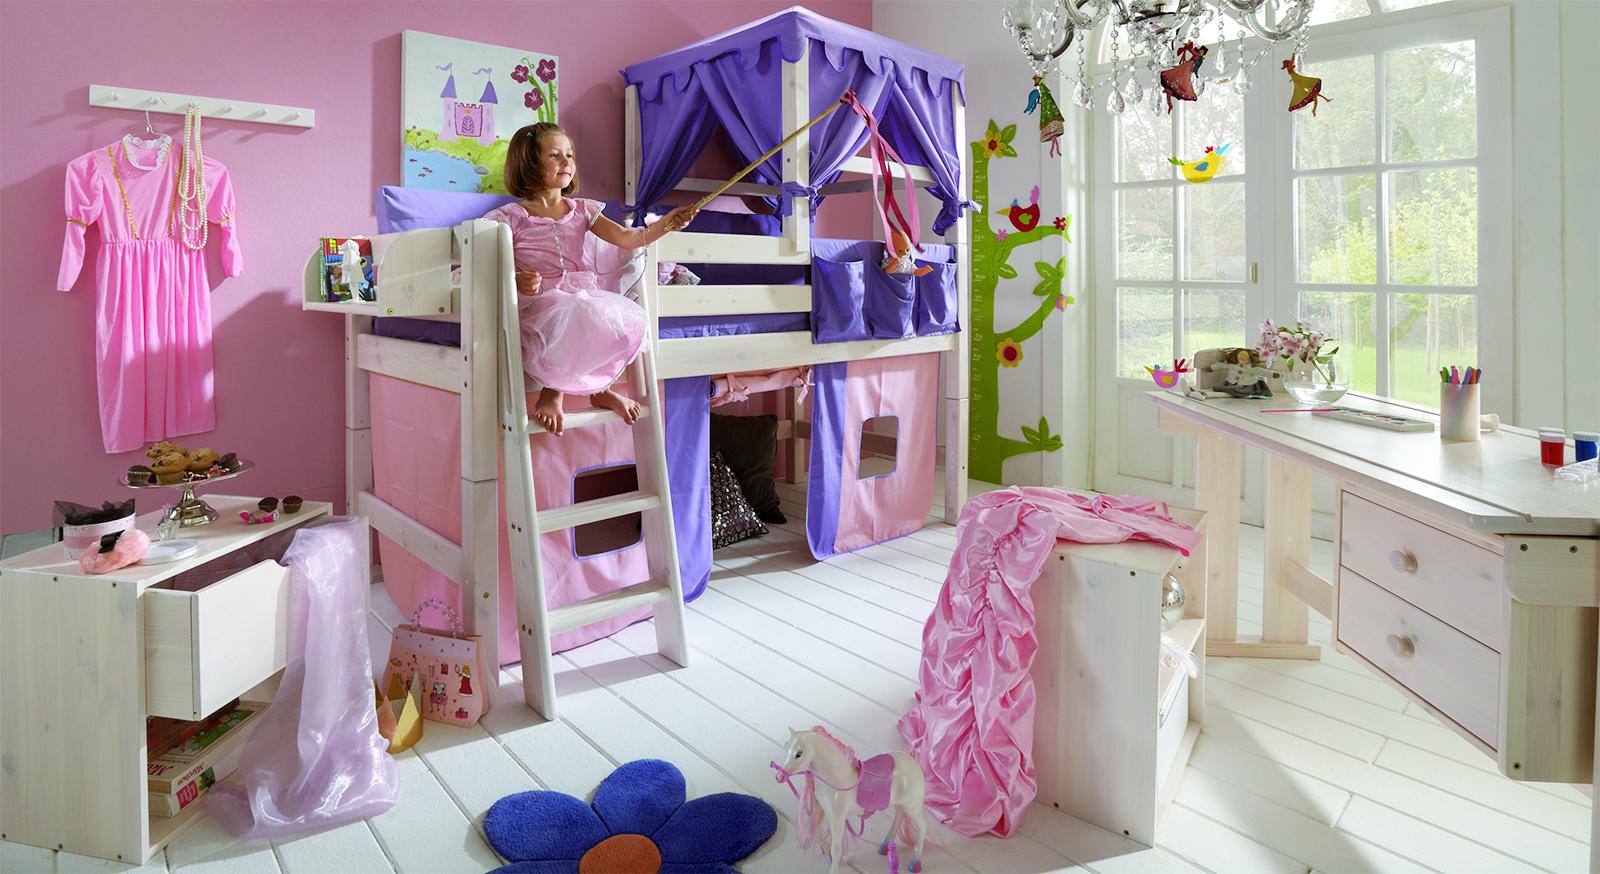 Kinderzimmer prinzessin  Kinderzimmer Prinzessin der Kids-Paradise-Serie mit lila